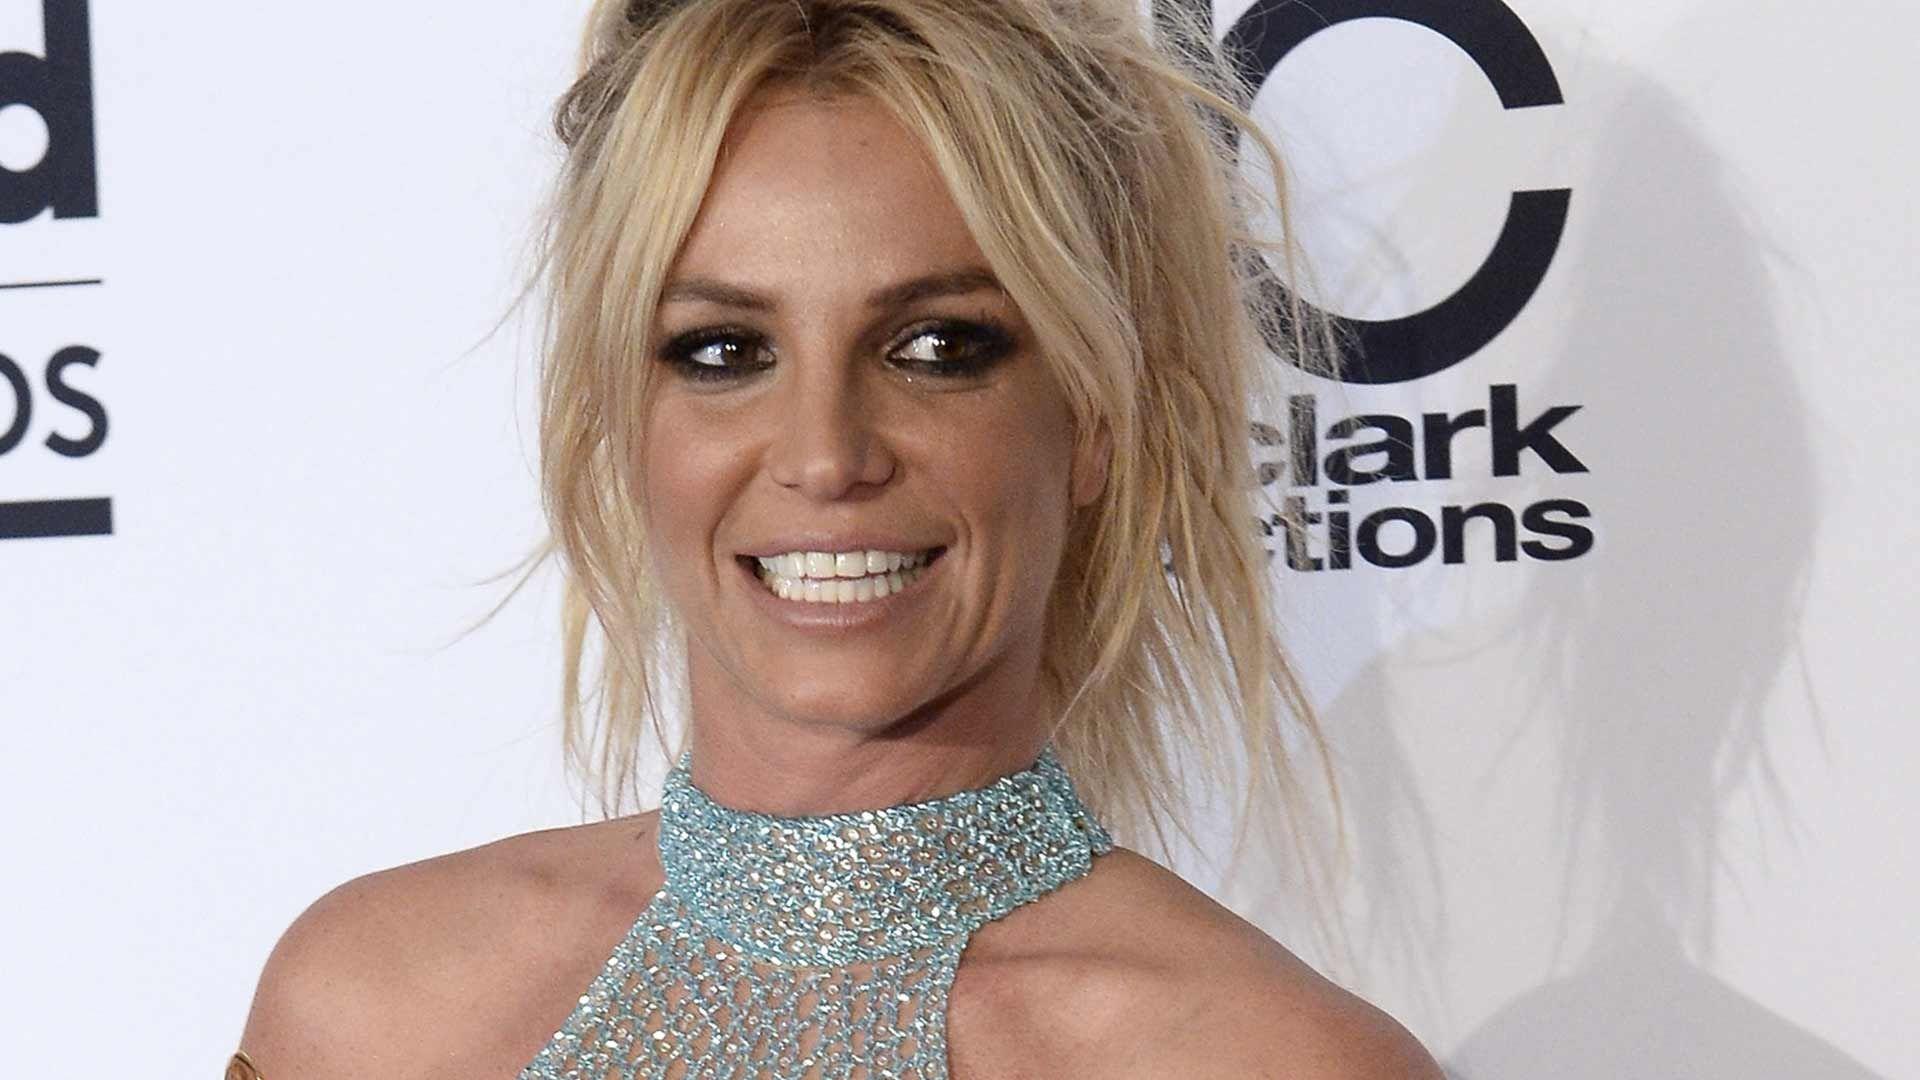 Britney Spears at Billboard Awards, 2016